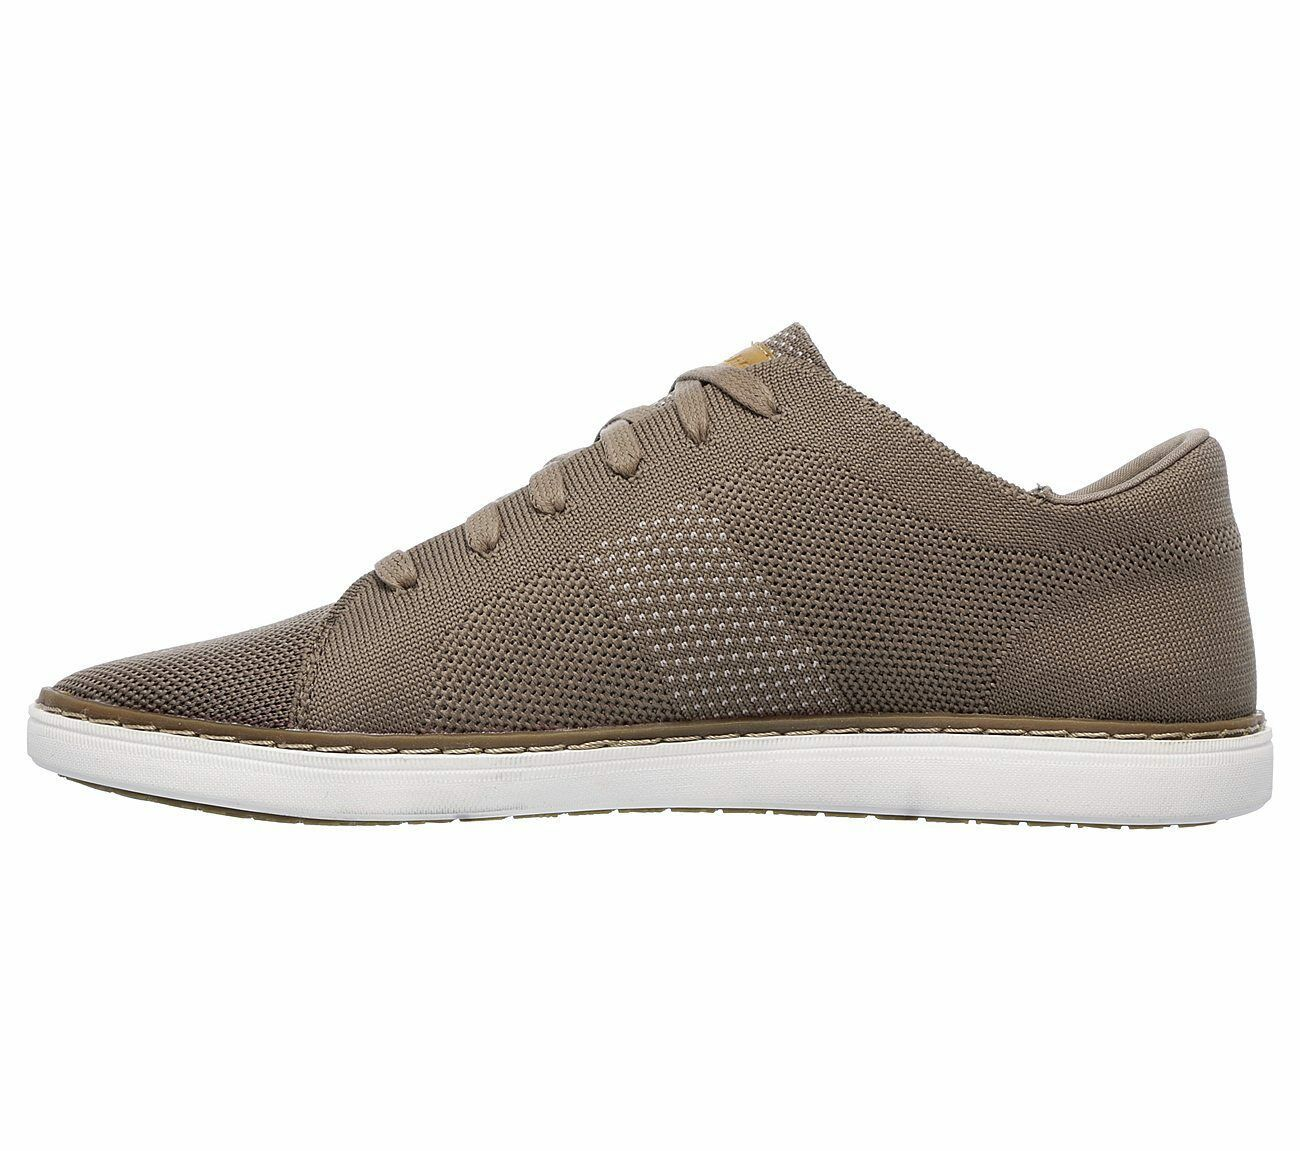 65088, SKECHERS, Lanson Revero, USA Men's Lace Up, Classic Fit, Casual Shoes image 13